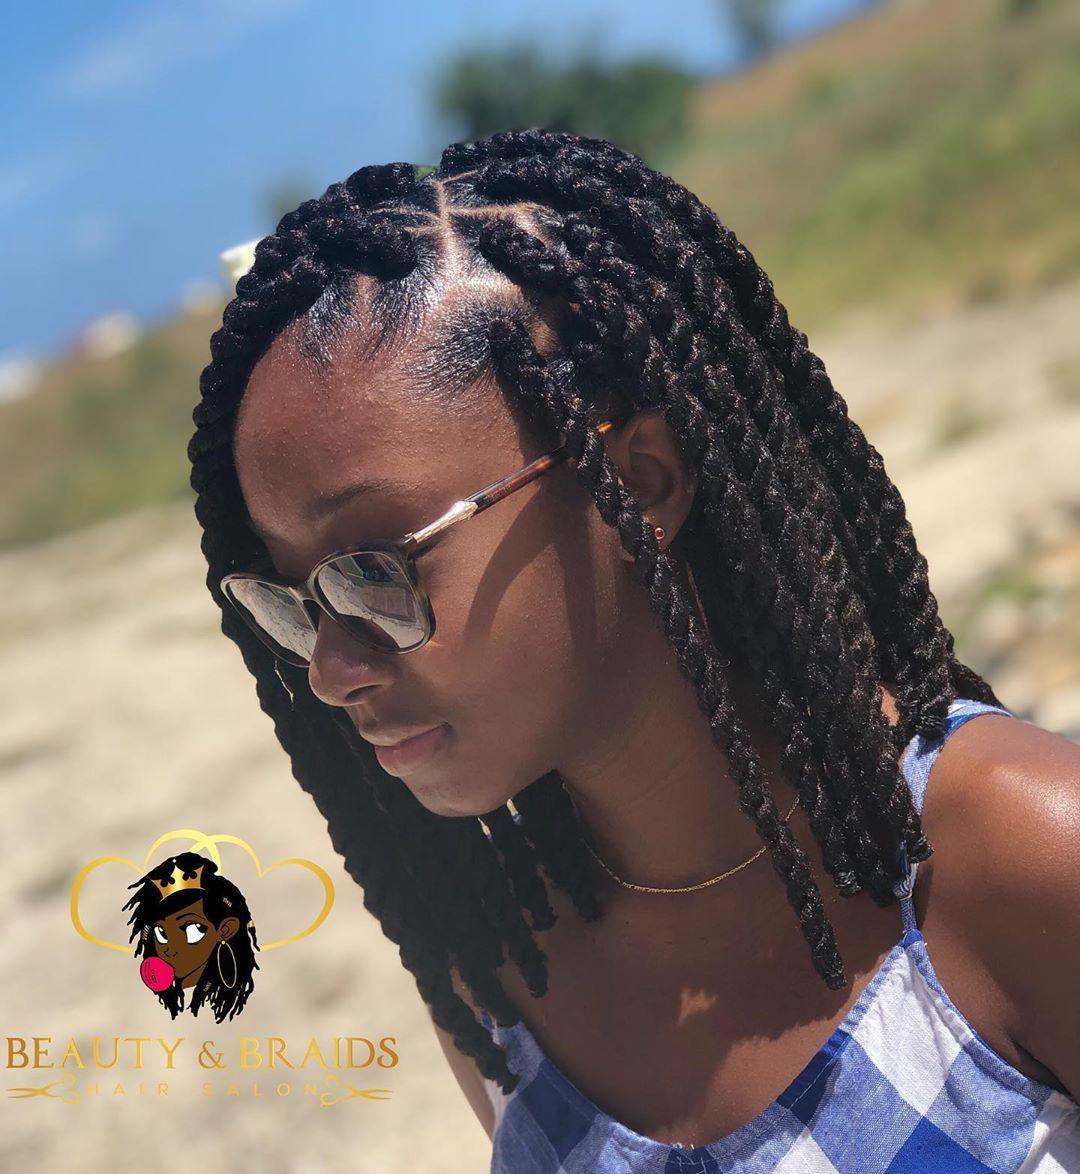 "Beauty & Braids Hair Salon on Instagram: ""😍😍😍 Marley Twist bobs for the win 😍😍😍 #braidsgang #fauxlocs #fauxlocsbarbados #bohemianlocs #goddesslocs #marleytwists #passiontwists"""